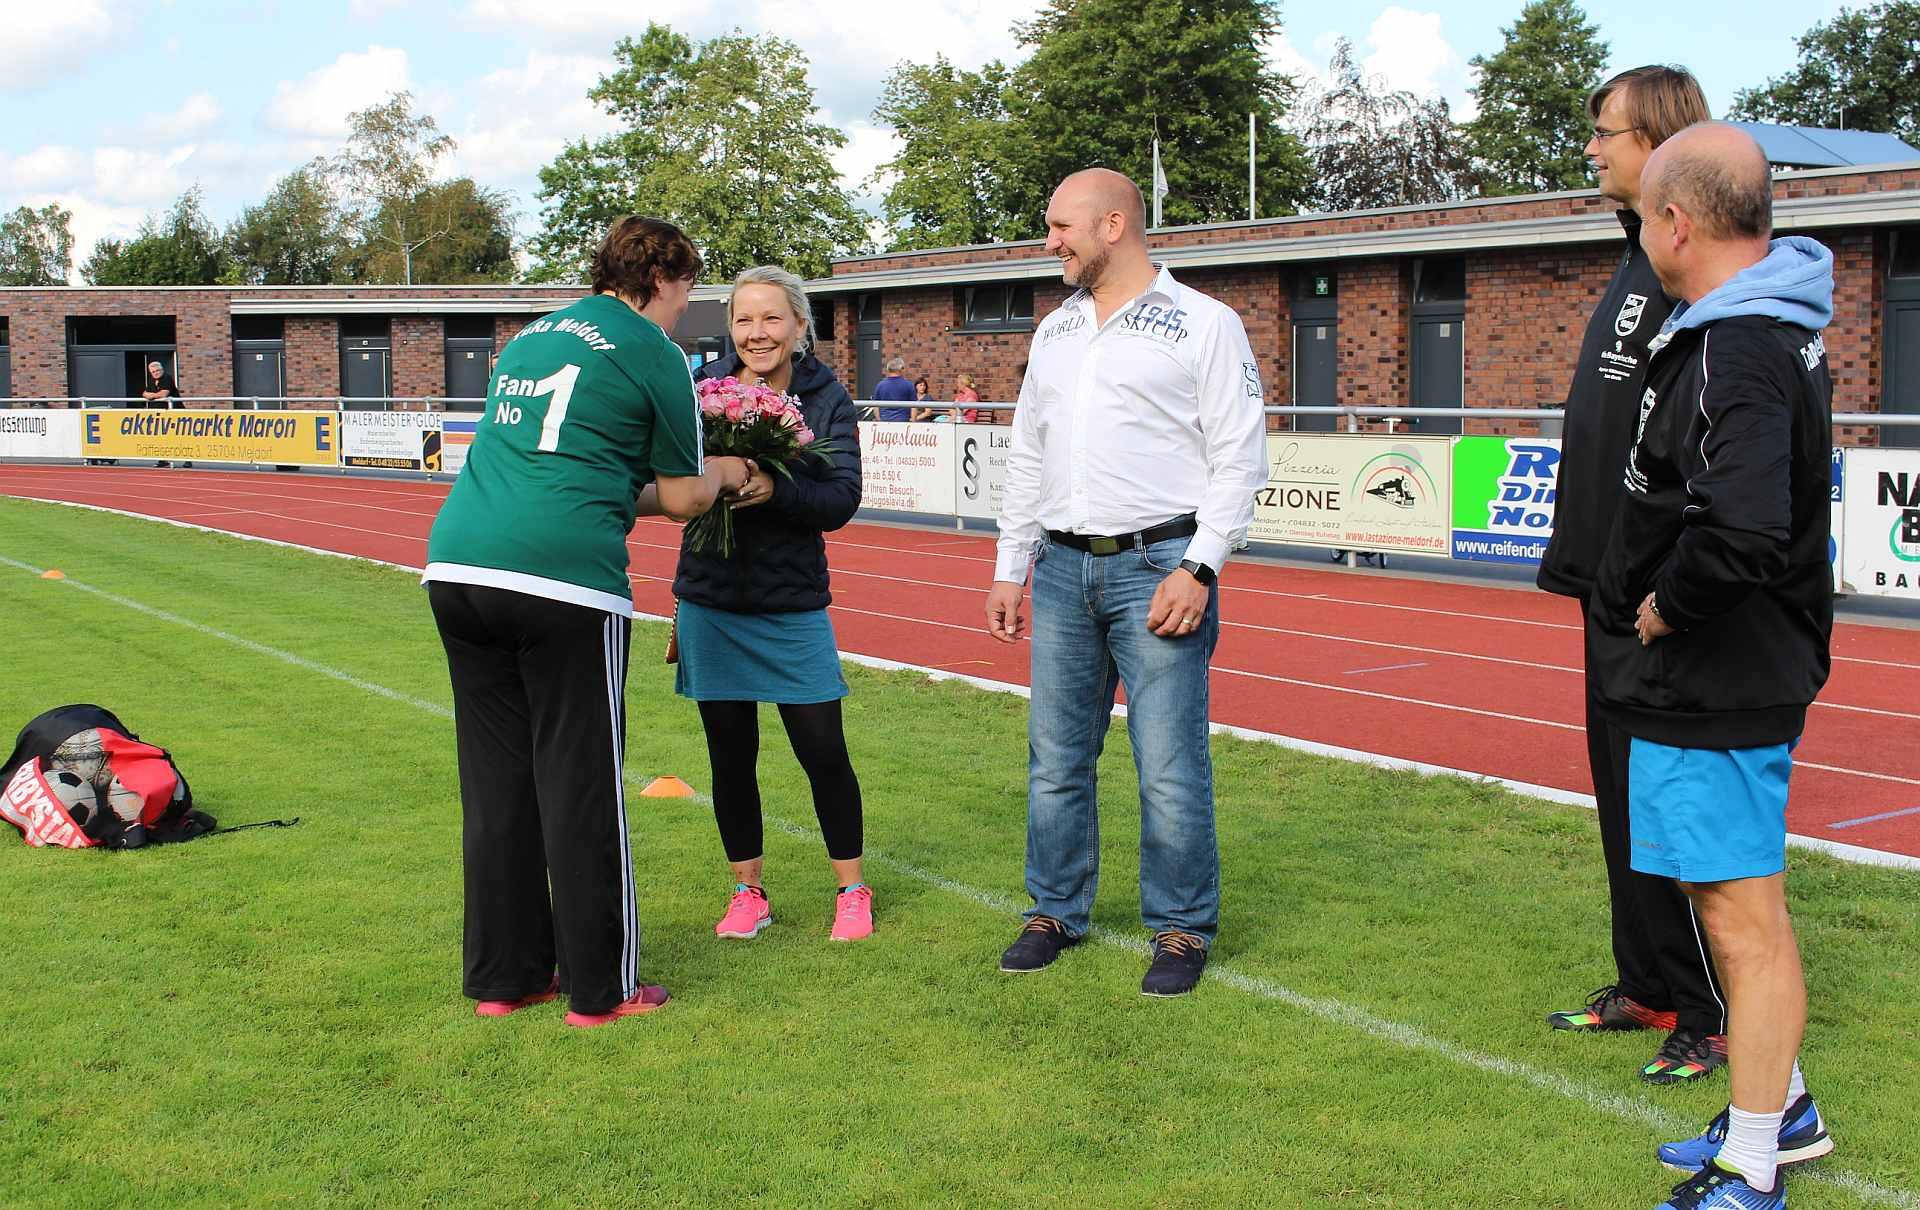 Fussball Pokalspiel E Jugend Tura Fc Burg 5 4 4 3 Tura